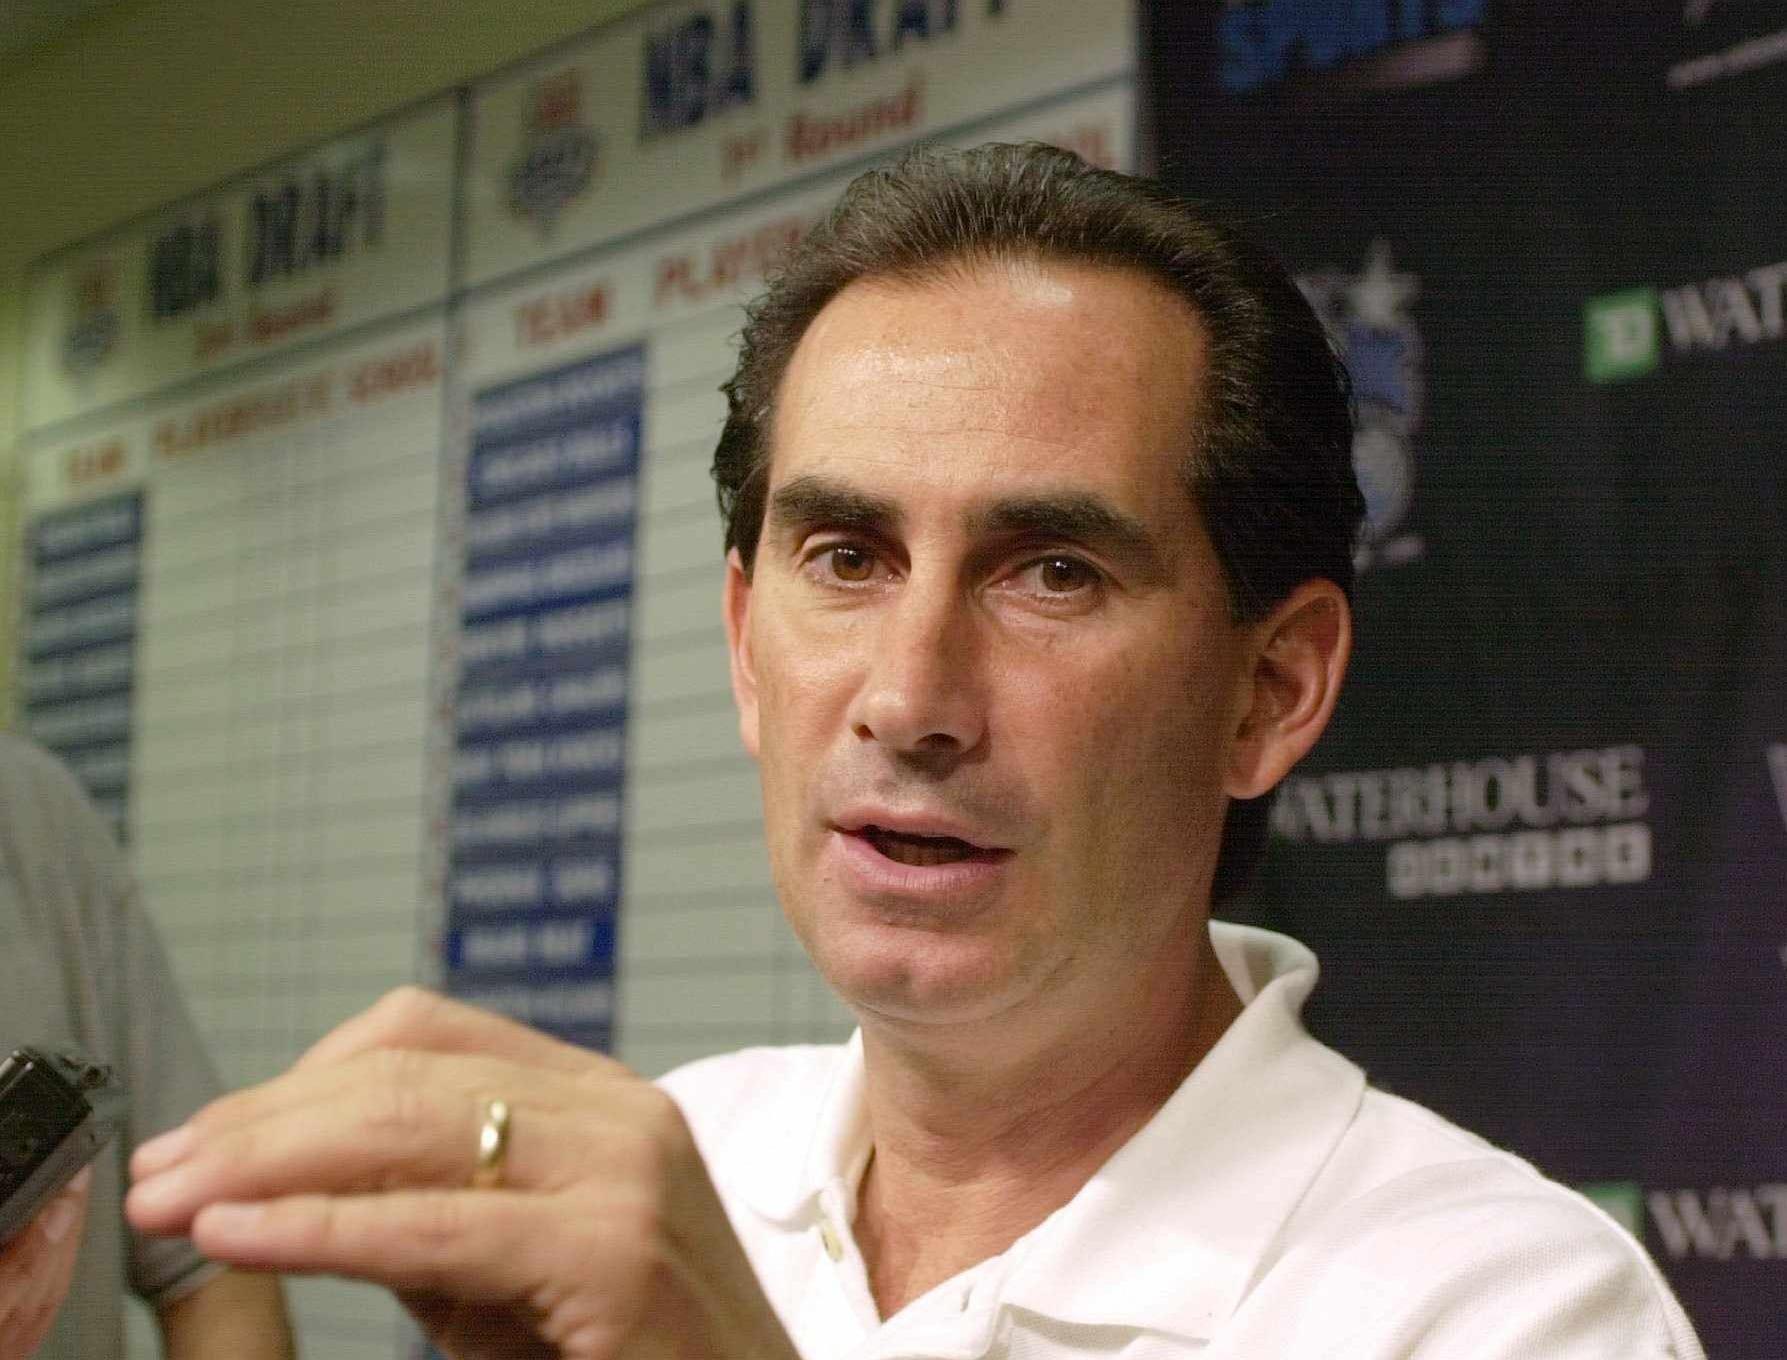 Orlando Magic general manager John Gabriel in 2002.